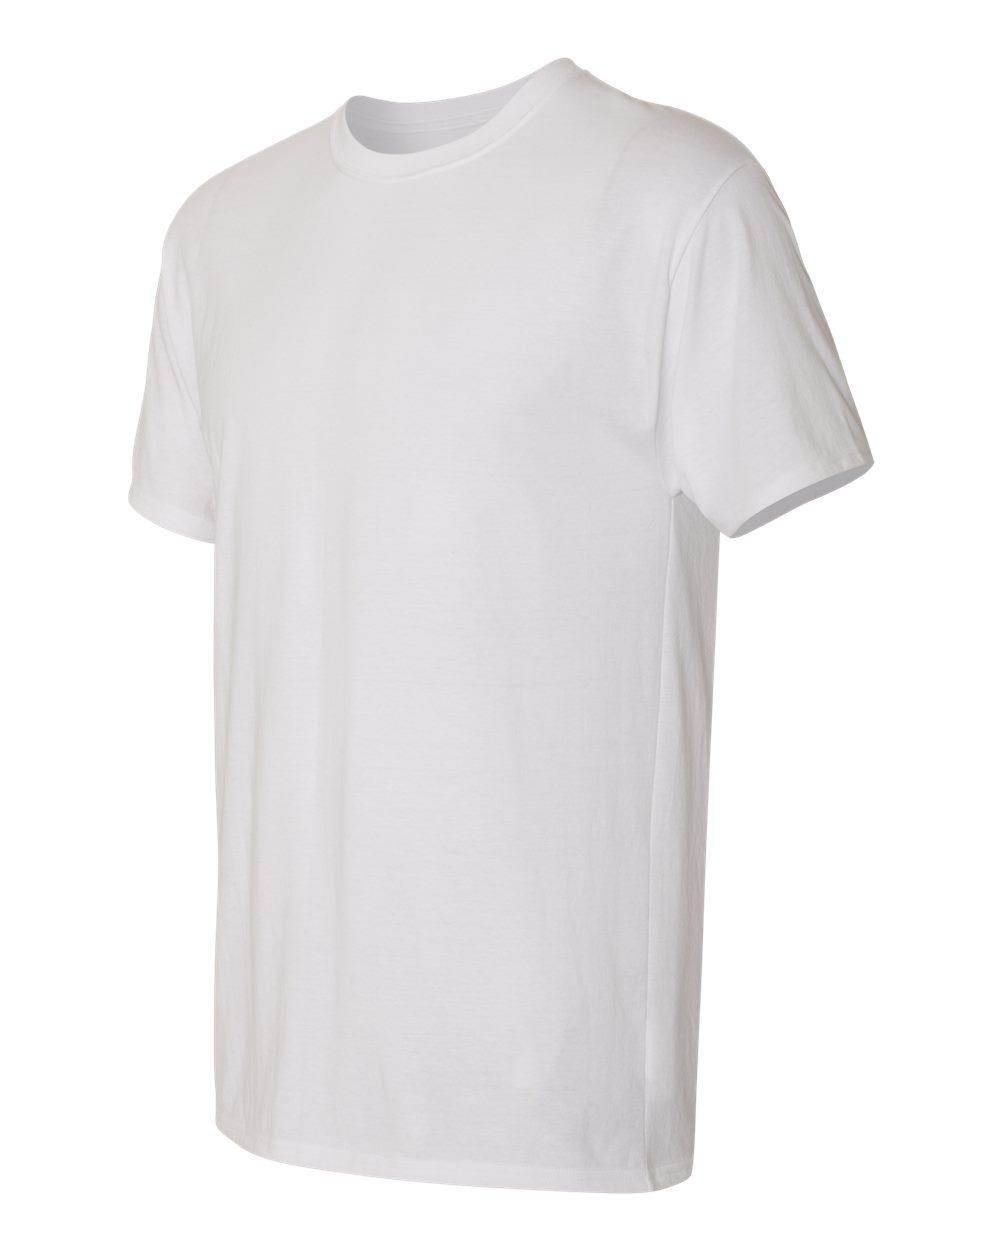 Hanes-Men-039-s-X-Temp-Triblend-T-Shirt-With-Fresh-Iq-42TB-S-3XL thumbnail 33